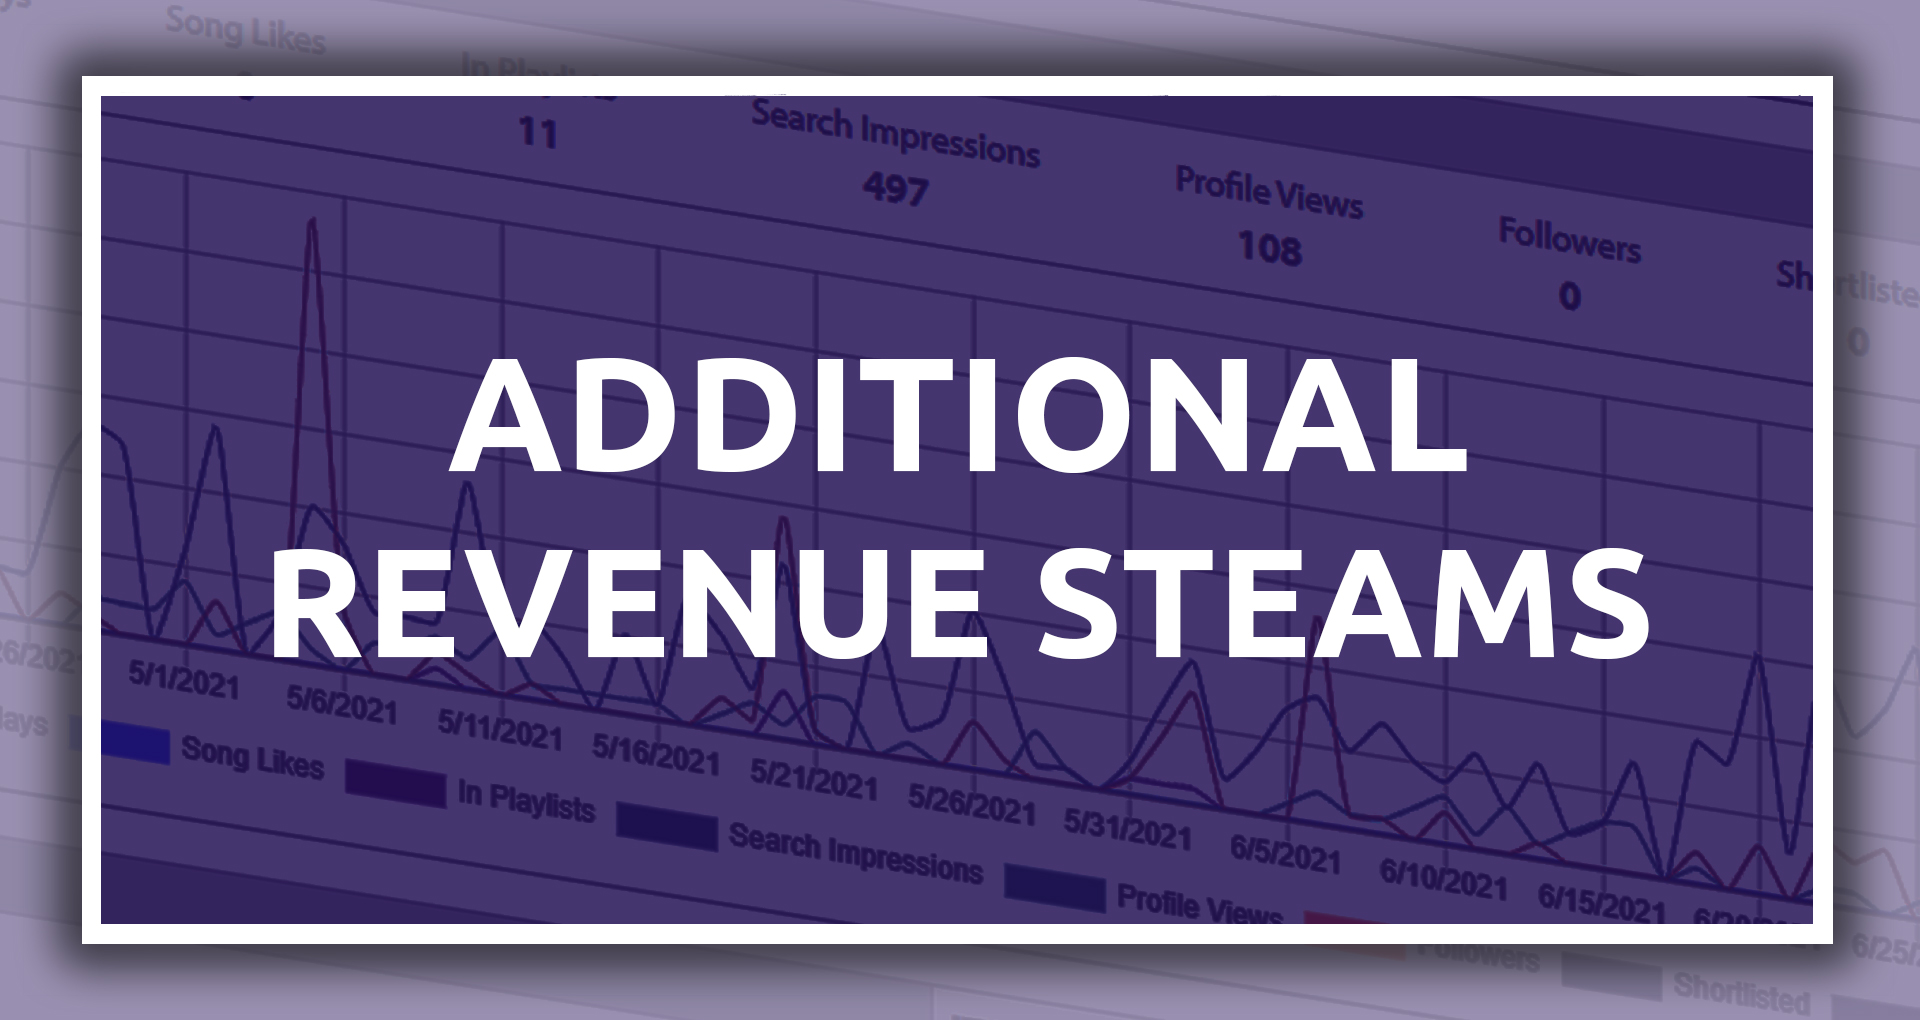 Additional Revenue Streams